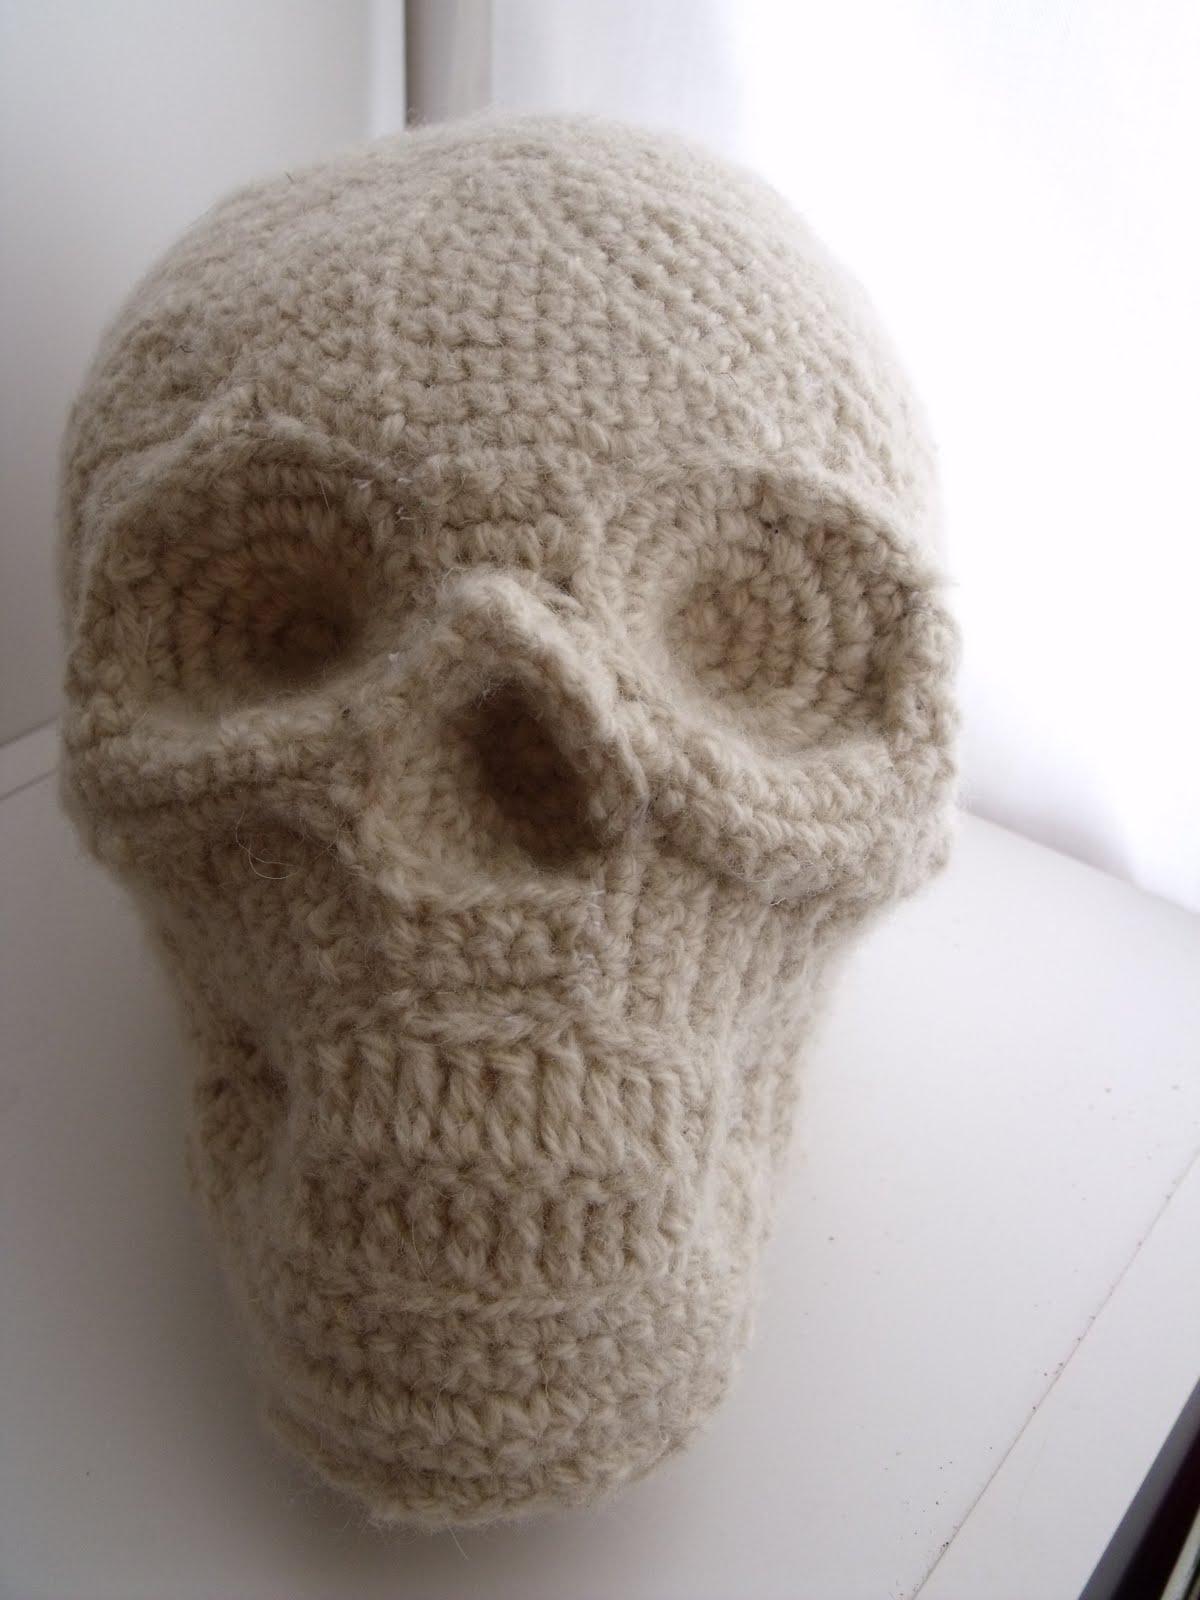 .: Human Skull Pillow